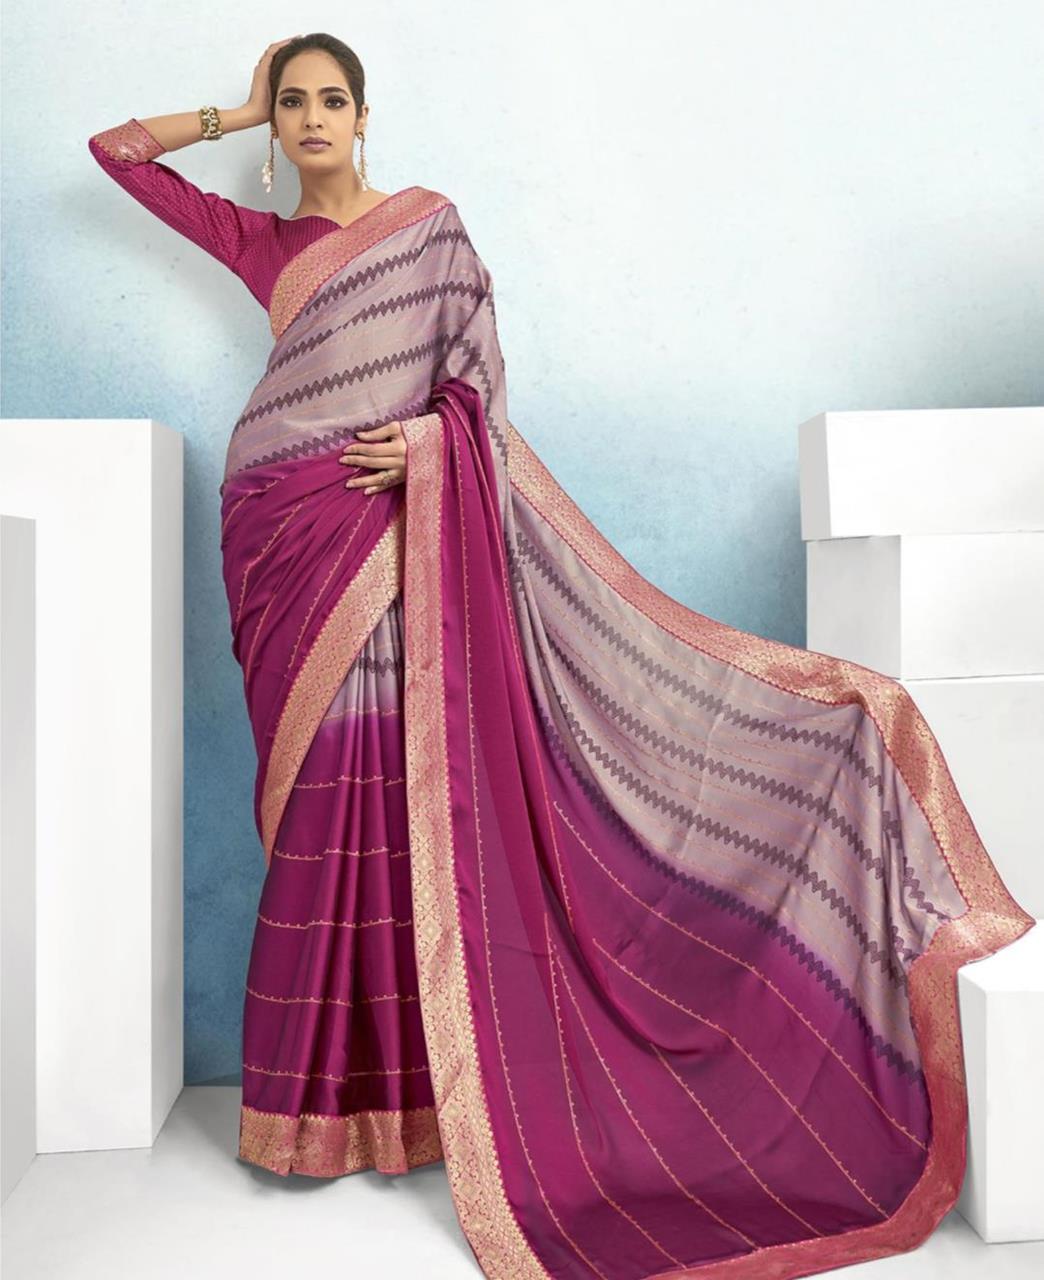 Lace Chiffon Saree in Pink